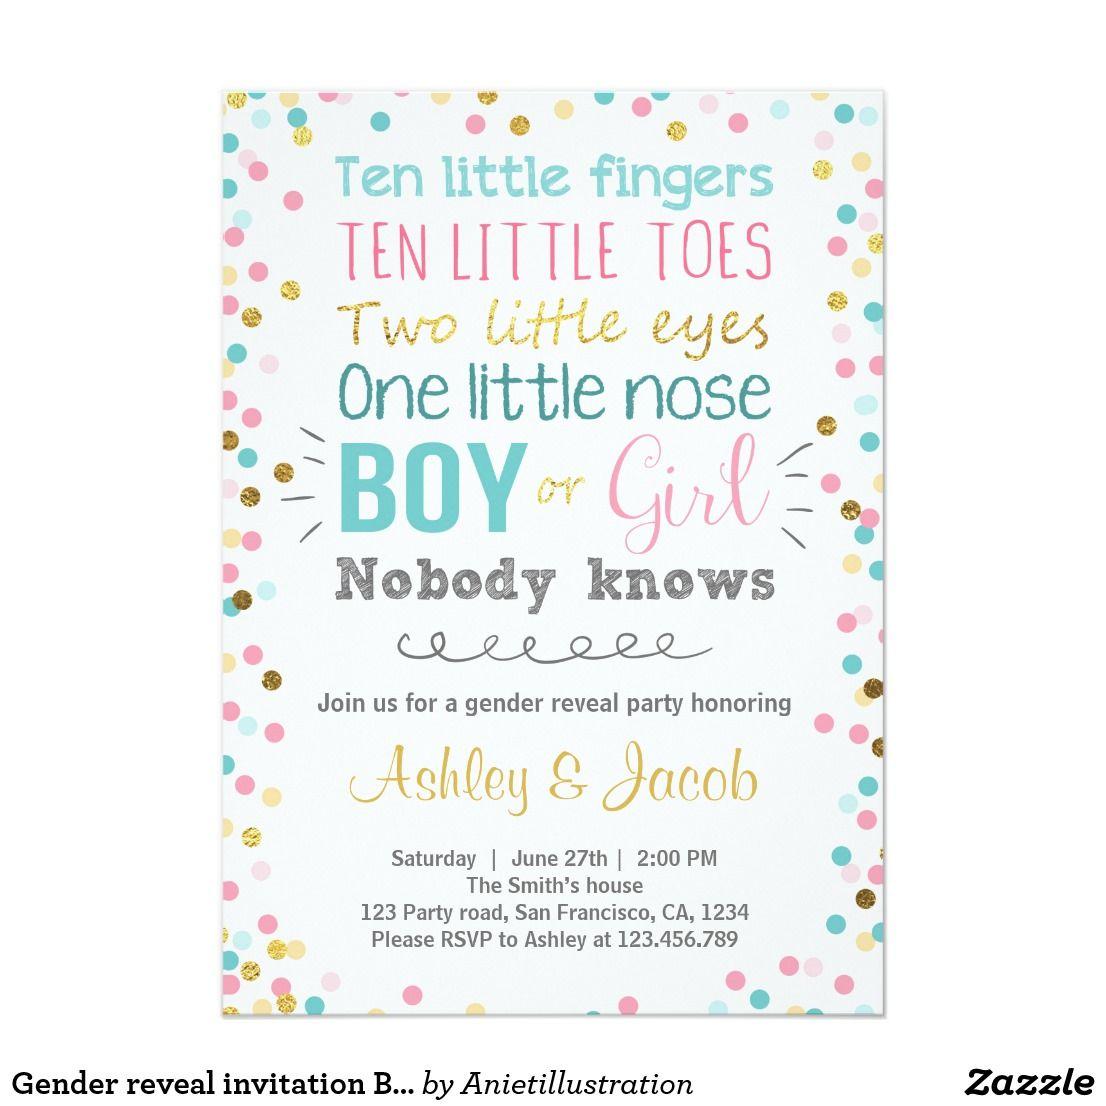 Gender reveal invitation Baby shower Boy or Girl | Invitations baby ...